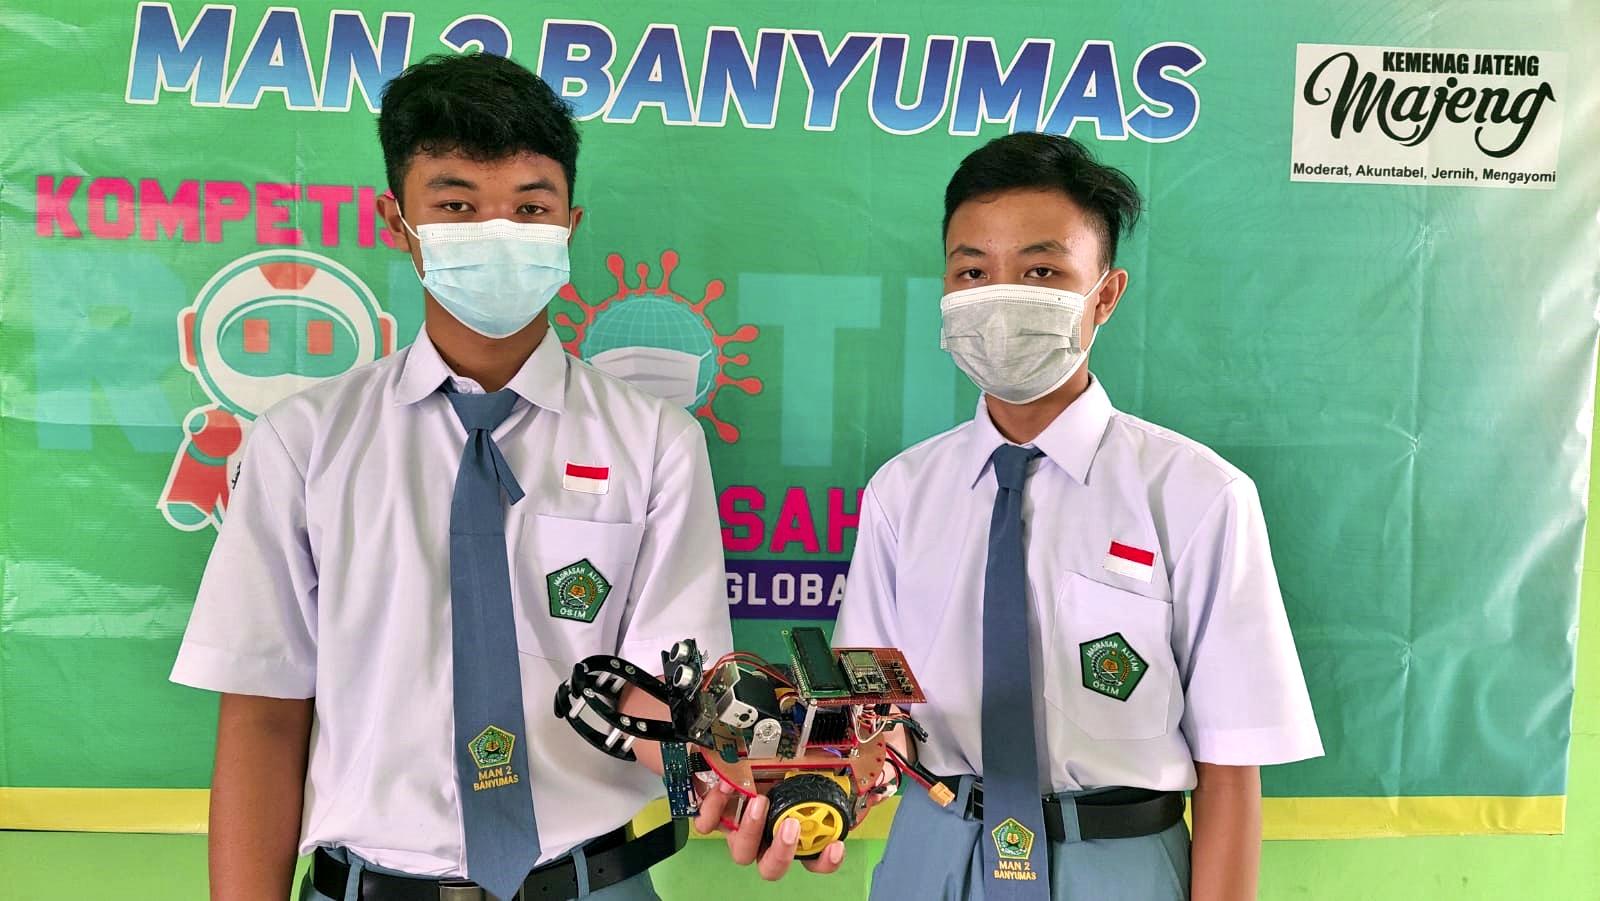 Prestasi Tim Robotik MAN 2 Banyumas Pada Ajang Madrasah Robotics Competition (MRC) 2021